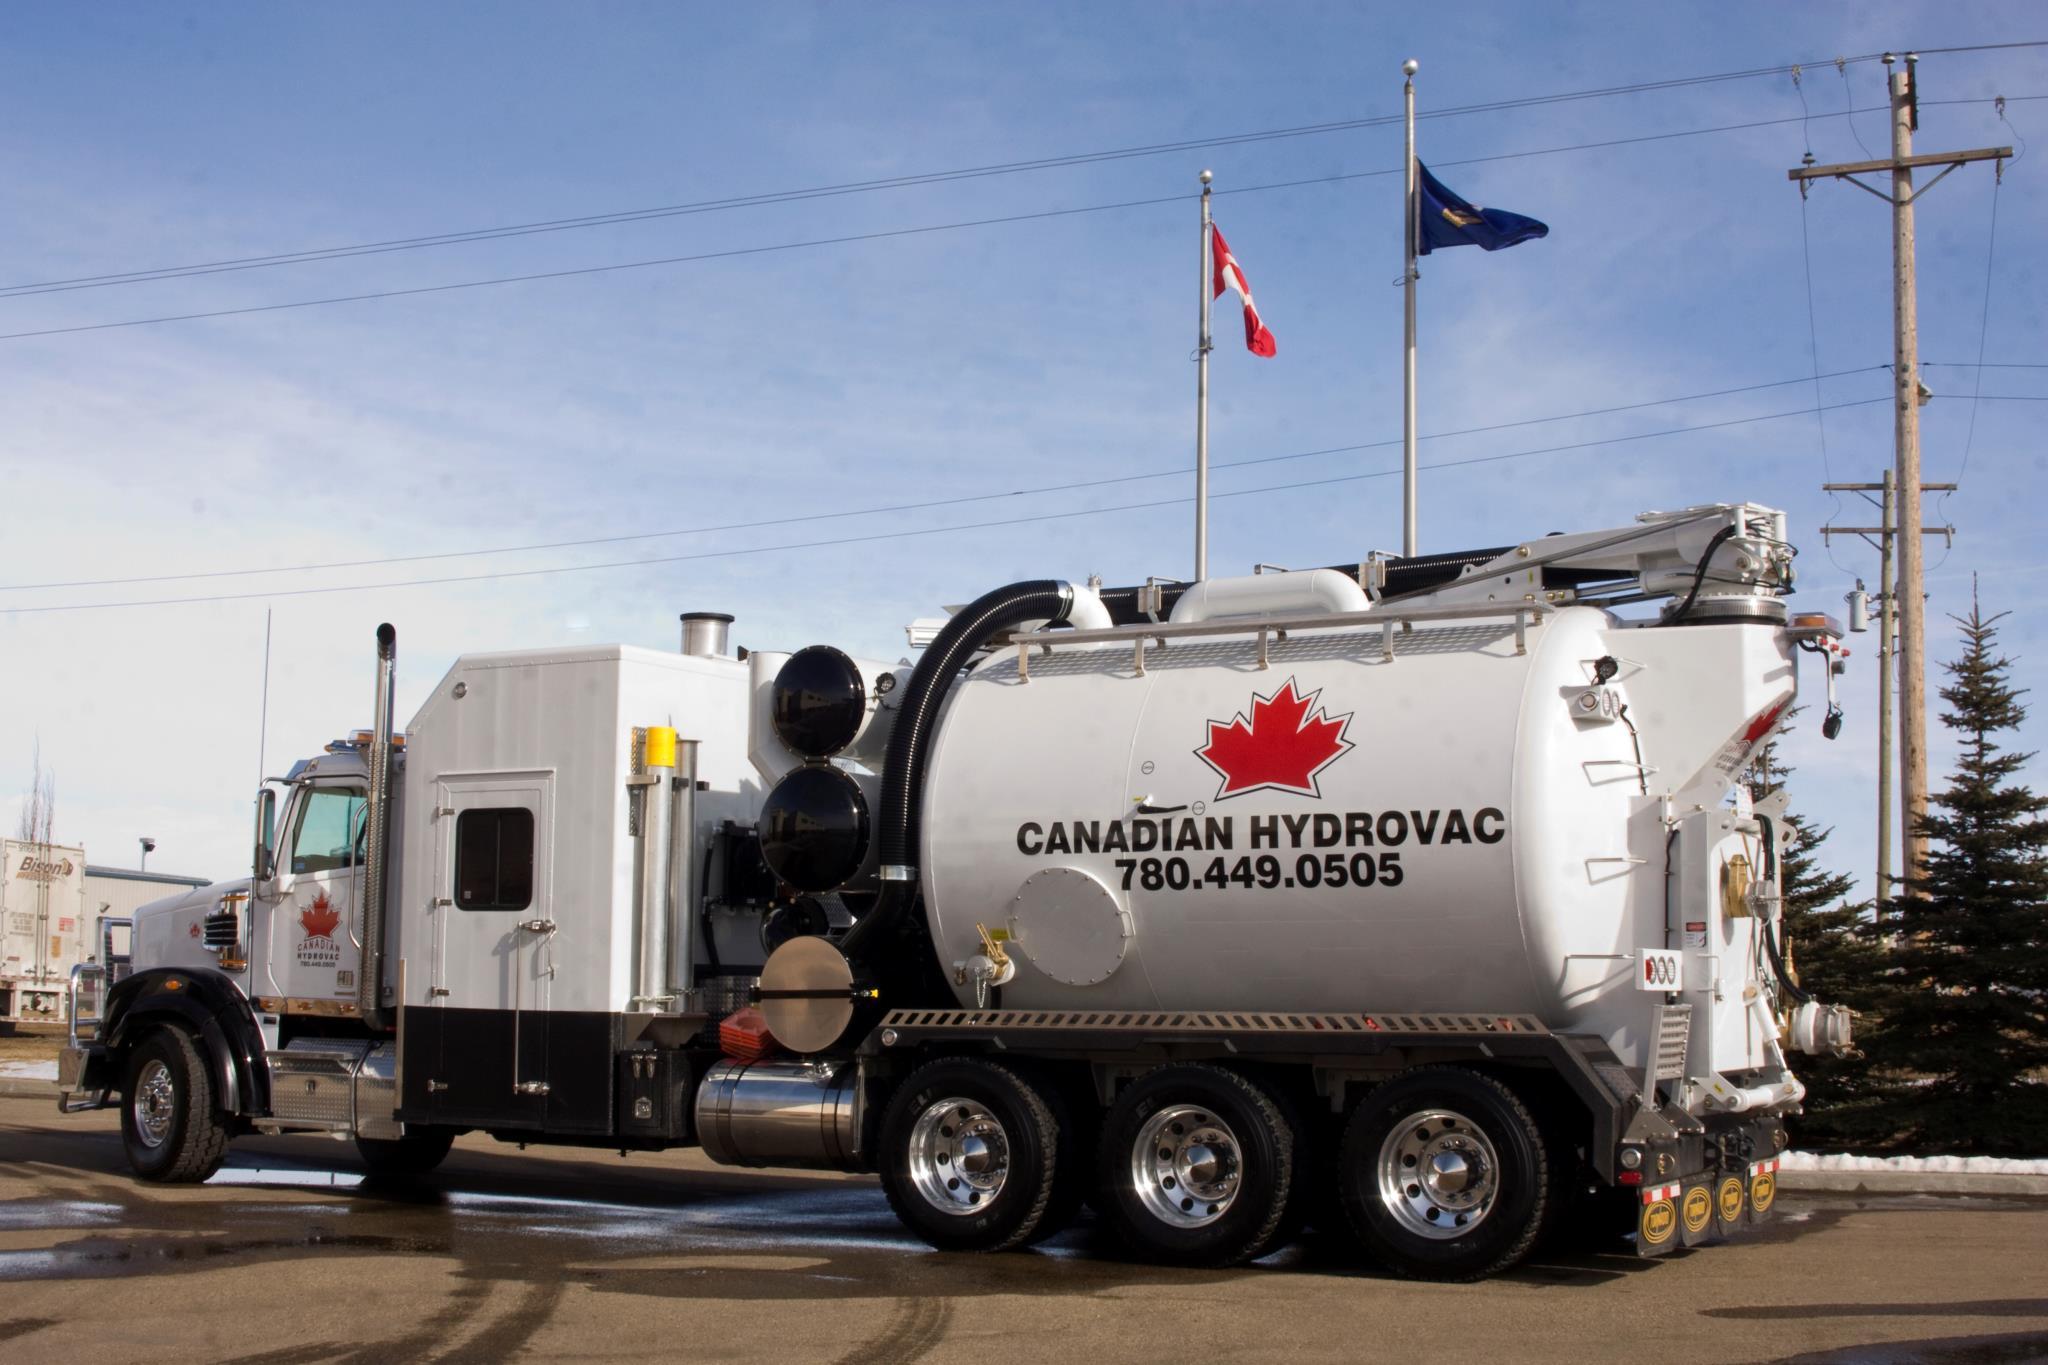 Photo uploaded by Canadian Hydrovac Ltd